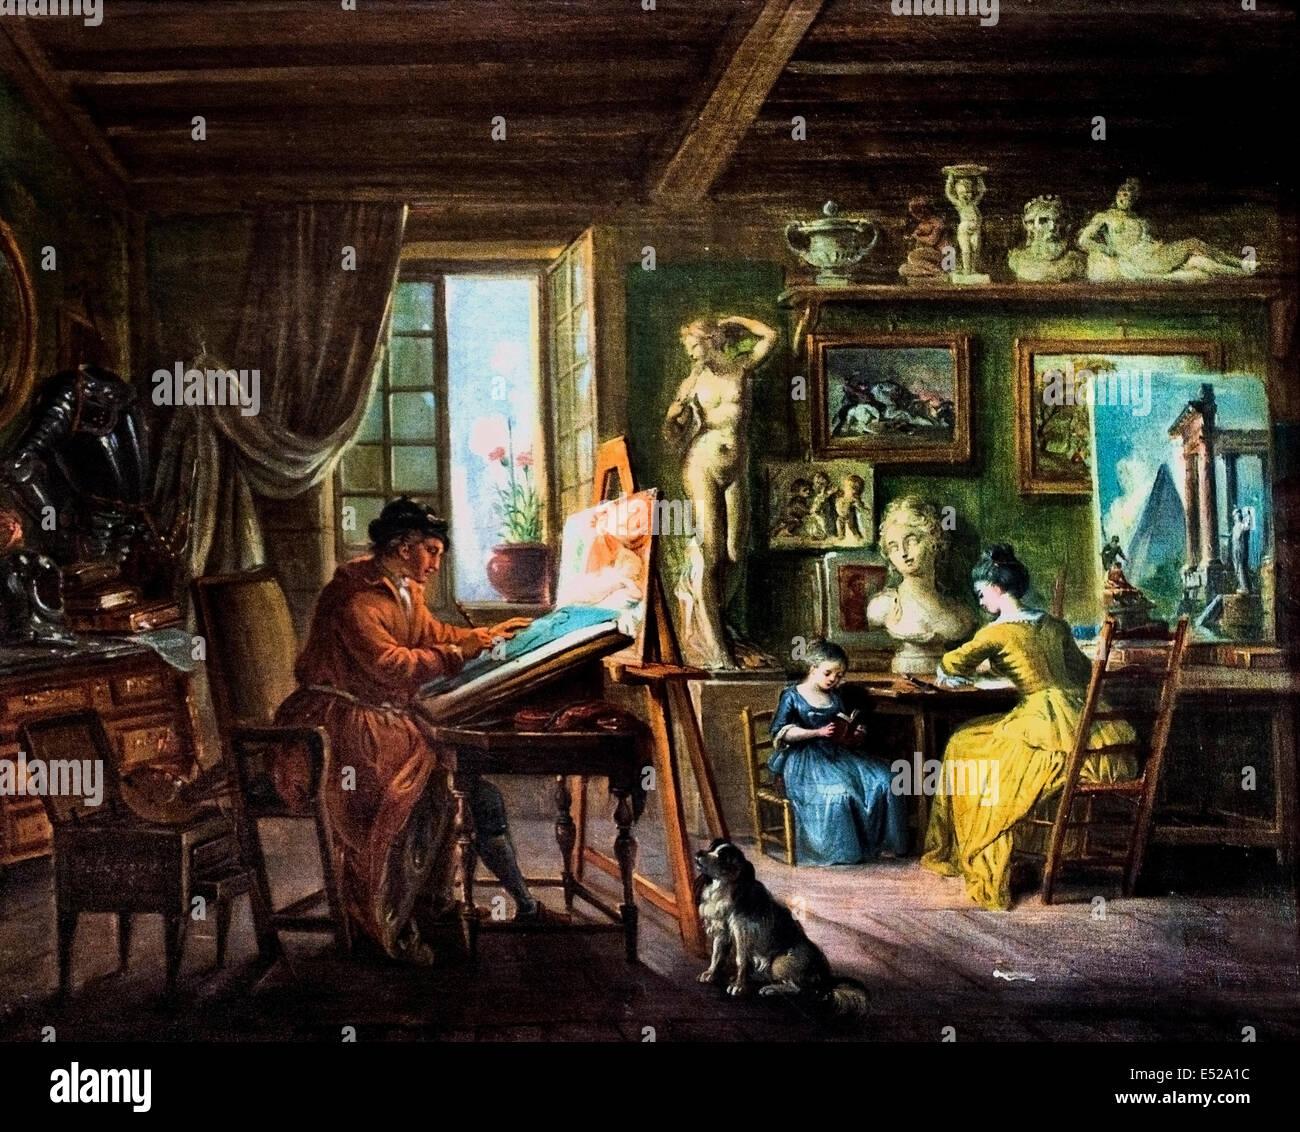 L`Atelier du Peintre - Workshop of the Painter by Jean Paptiste Lallemand 1716-1803 France French - Stock Image